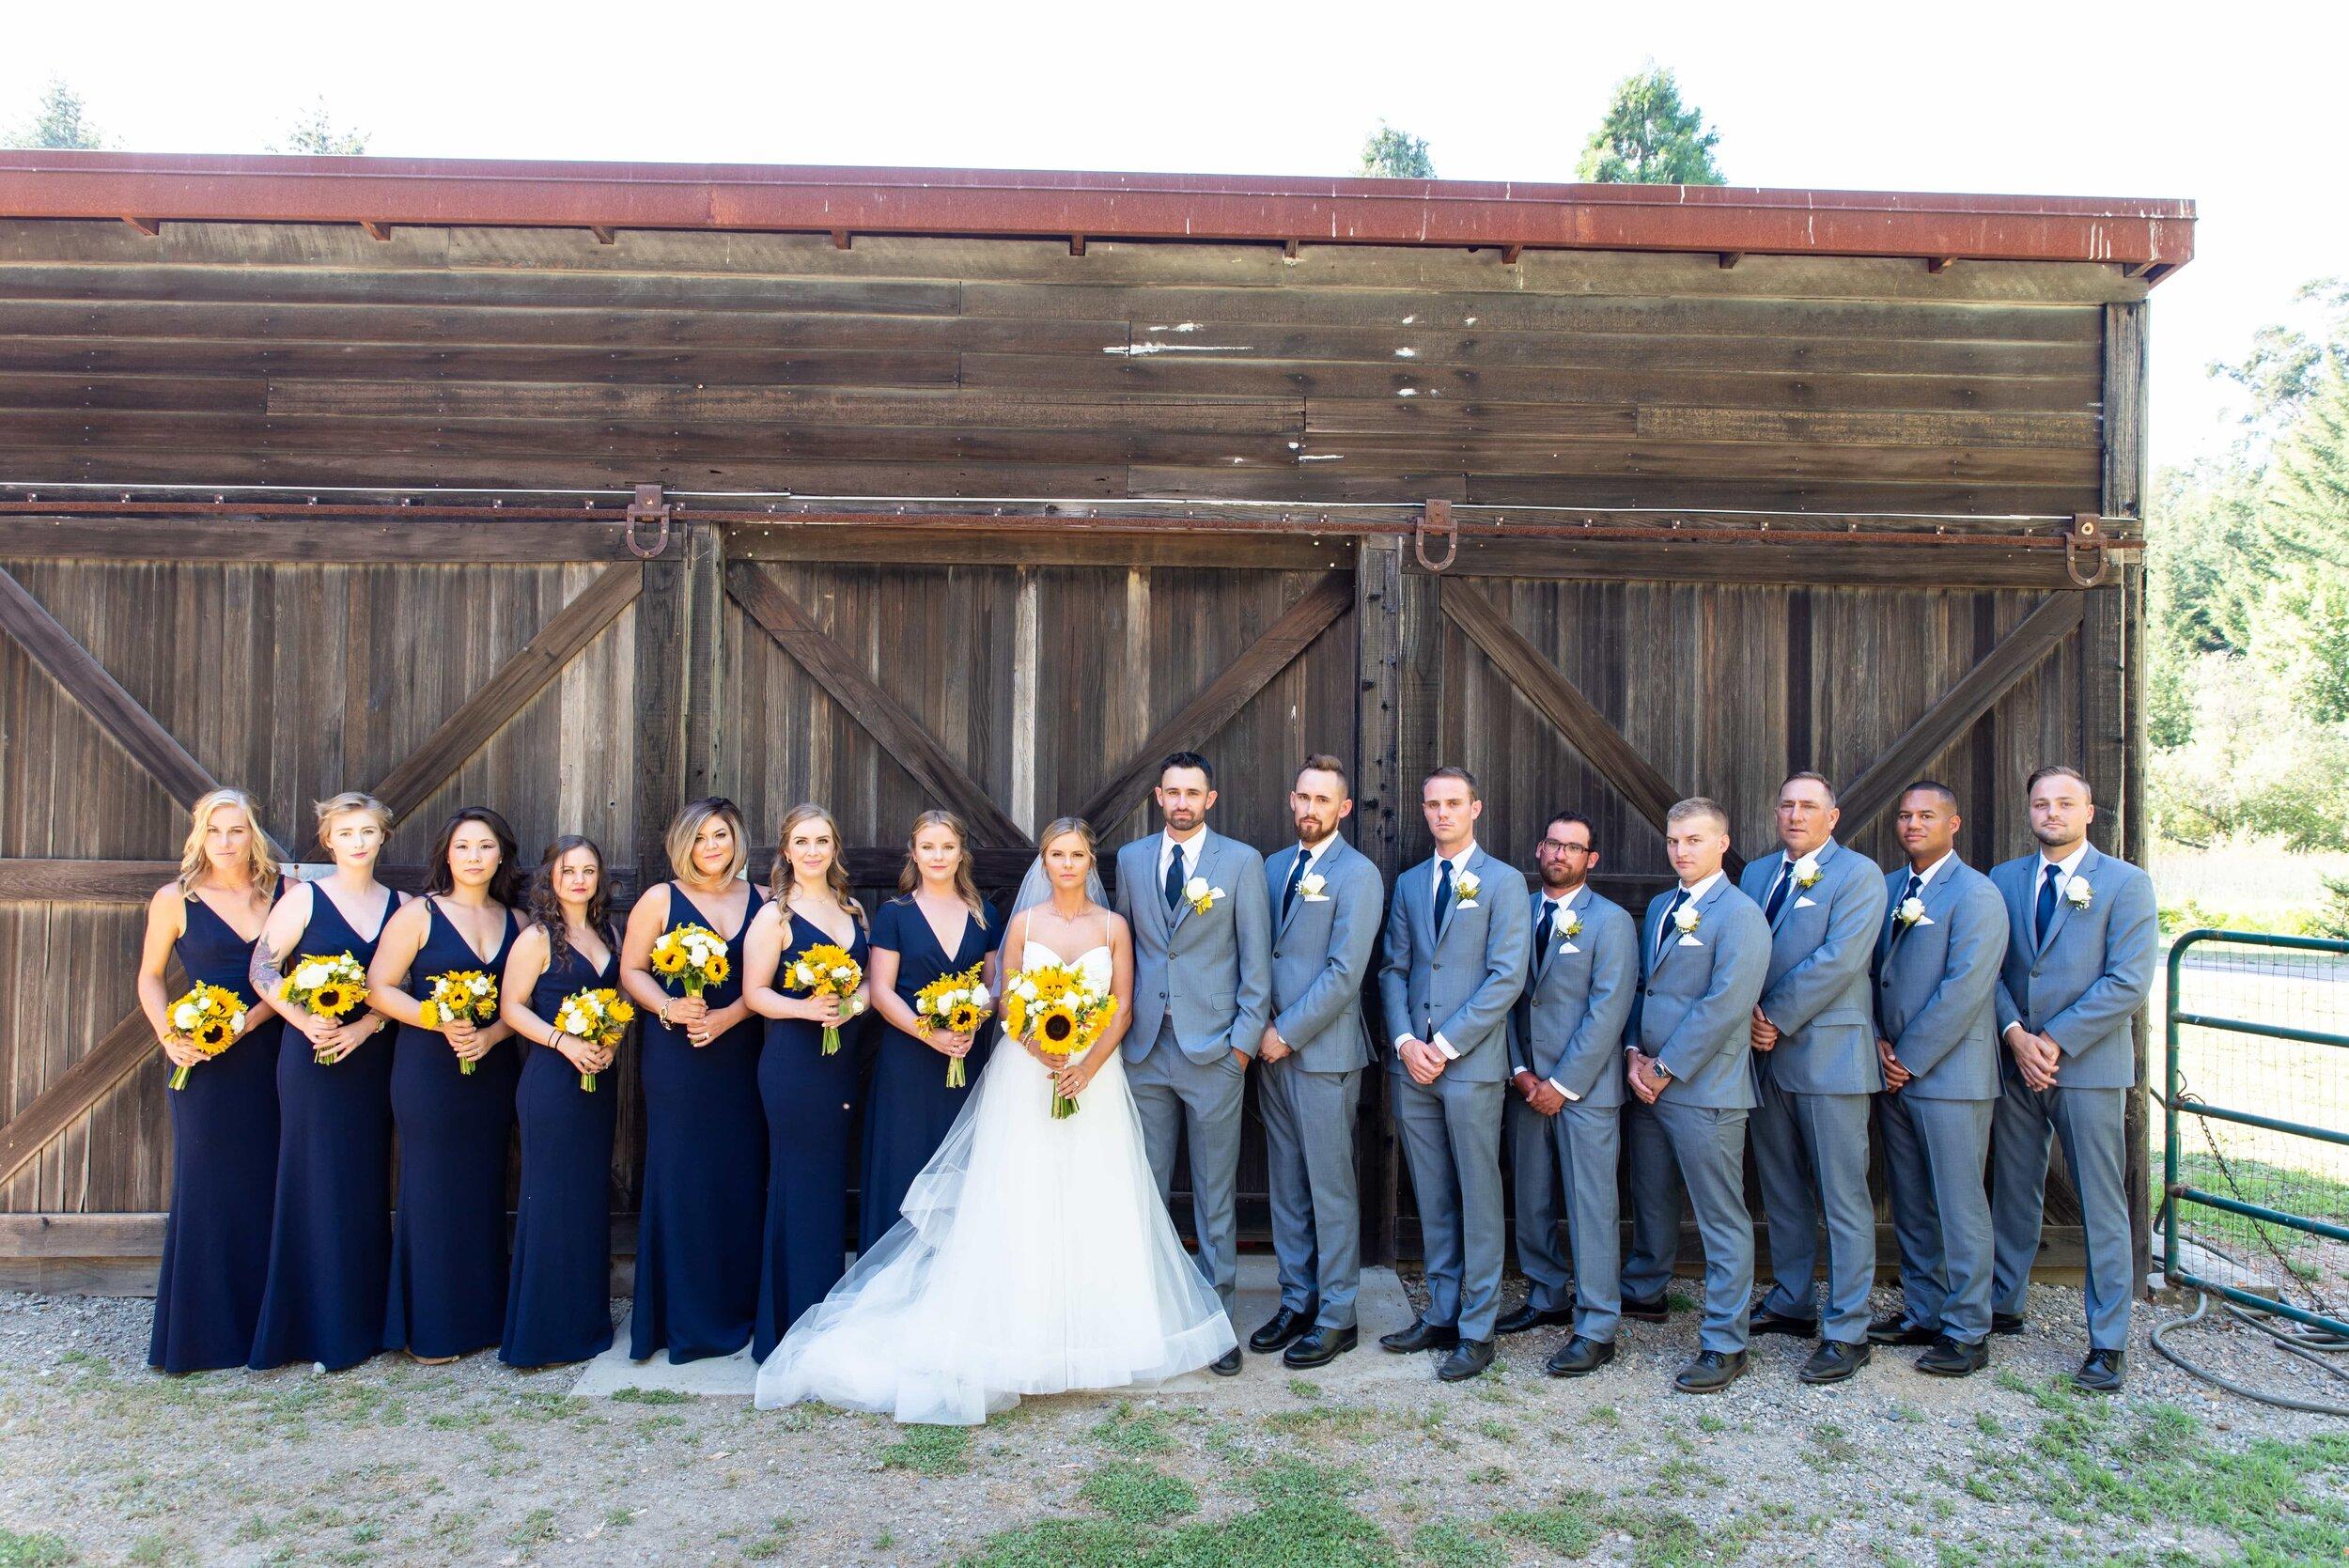 Rustic barn wedding party photo